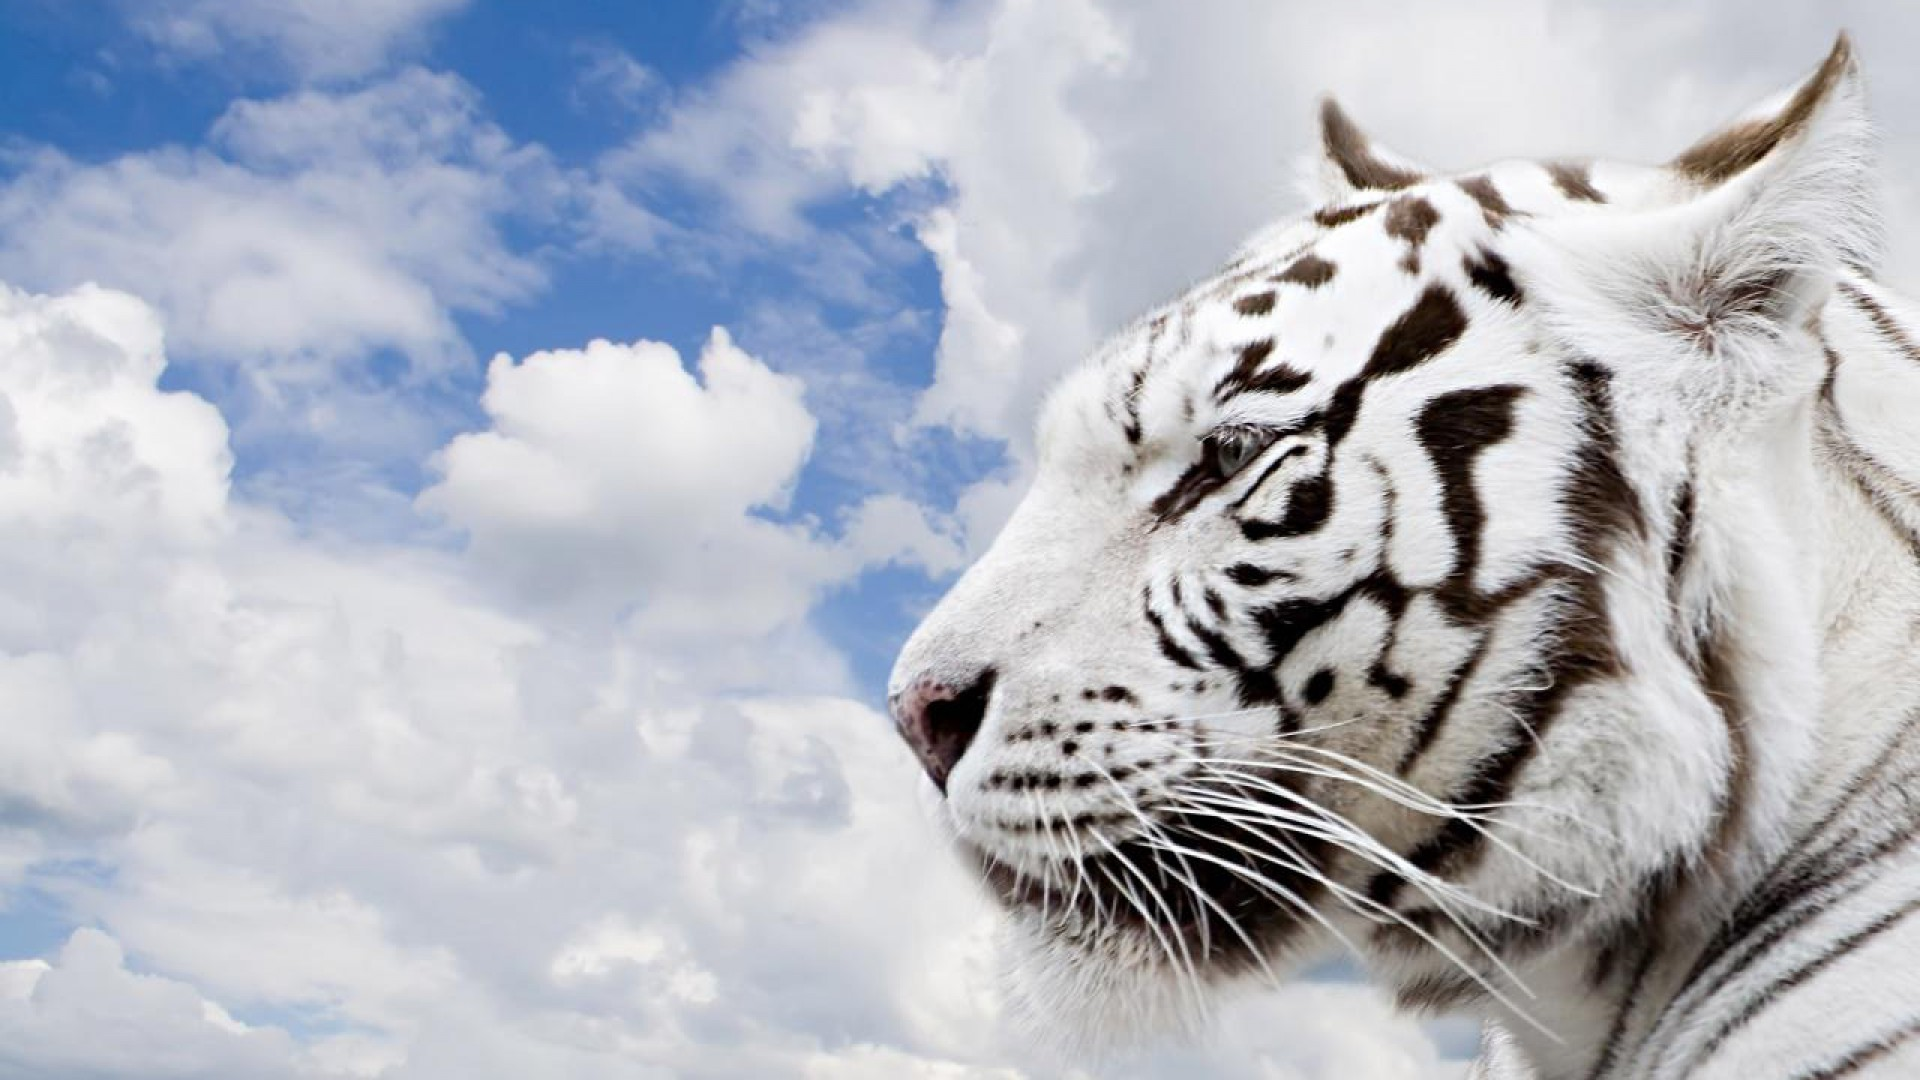 High Resolution White Tiger 1080p Wallpaper Full Size .